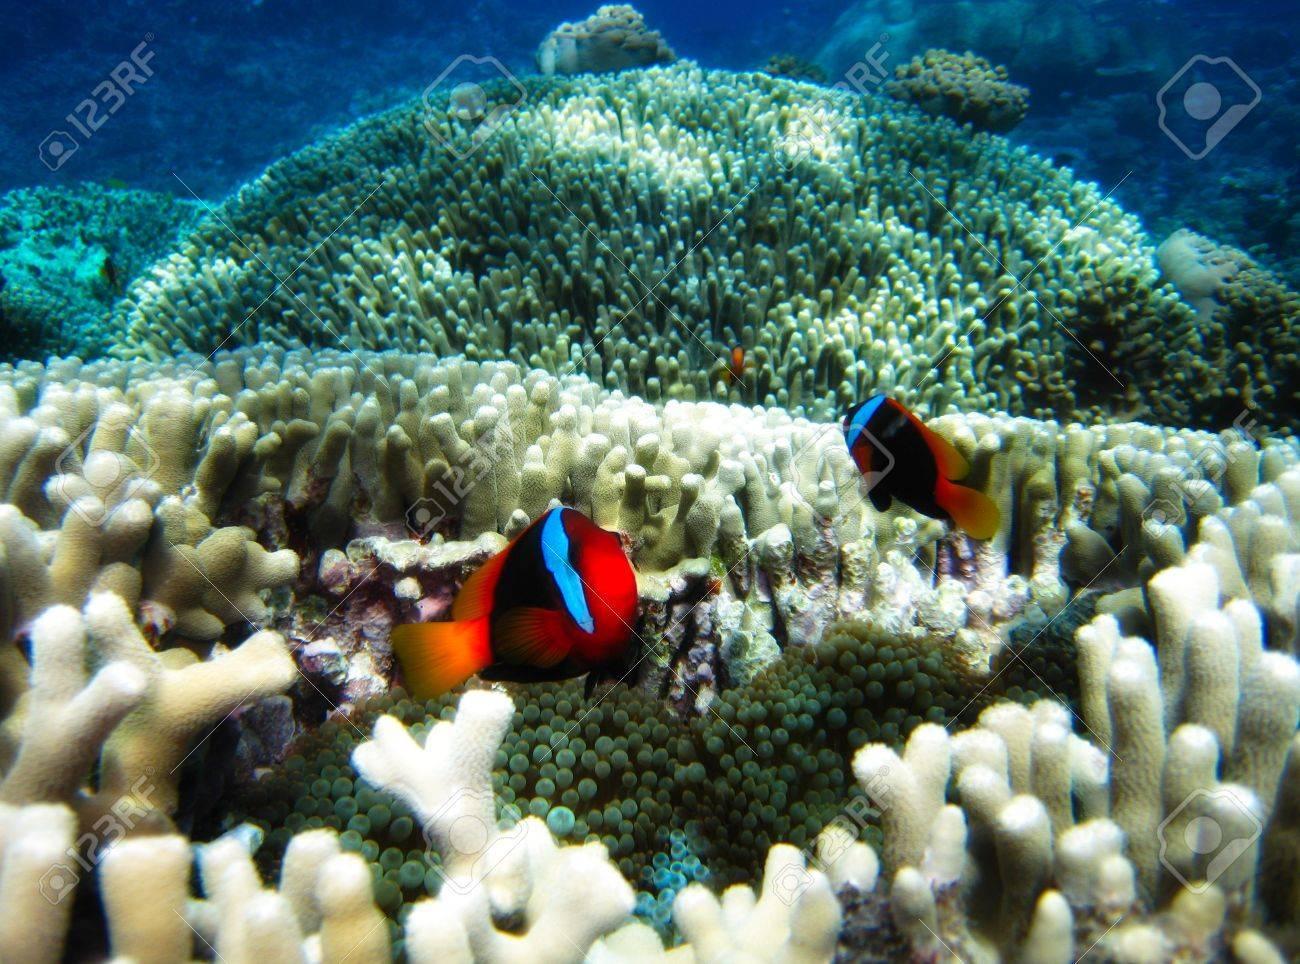 Nemo Fish on the Great Barrier Reef in Queensland, Australia Stock Photo - 16384929